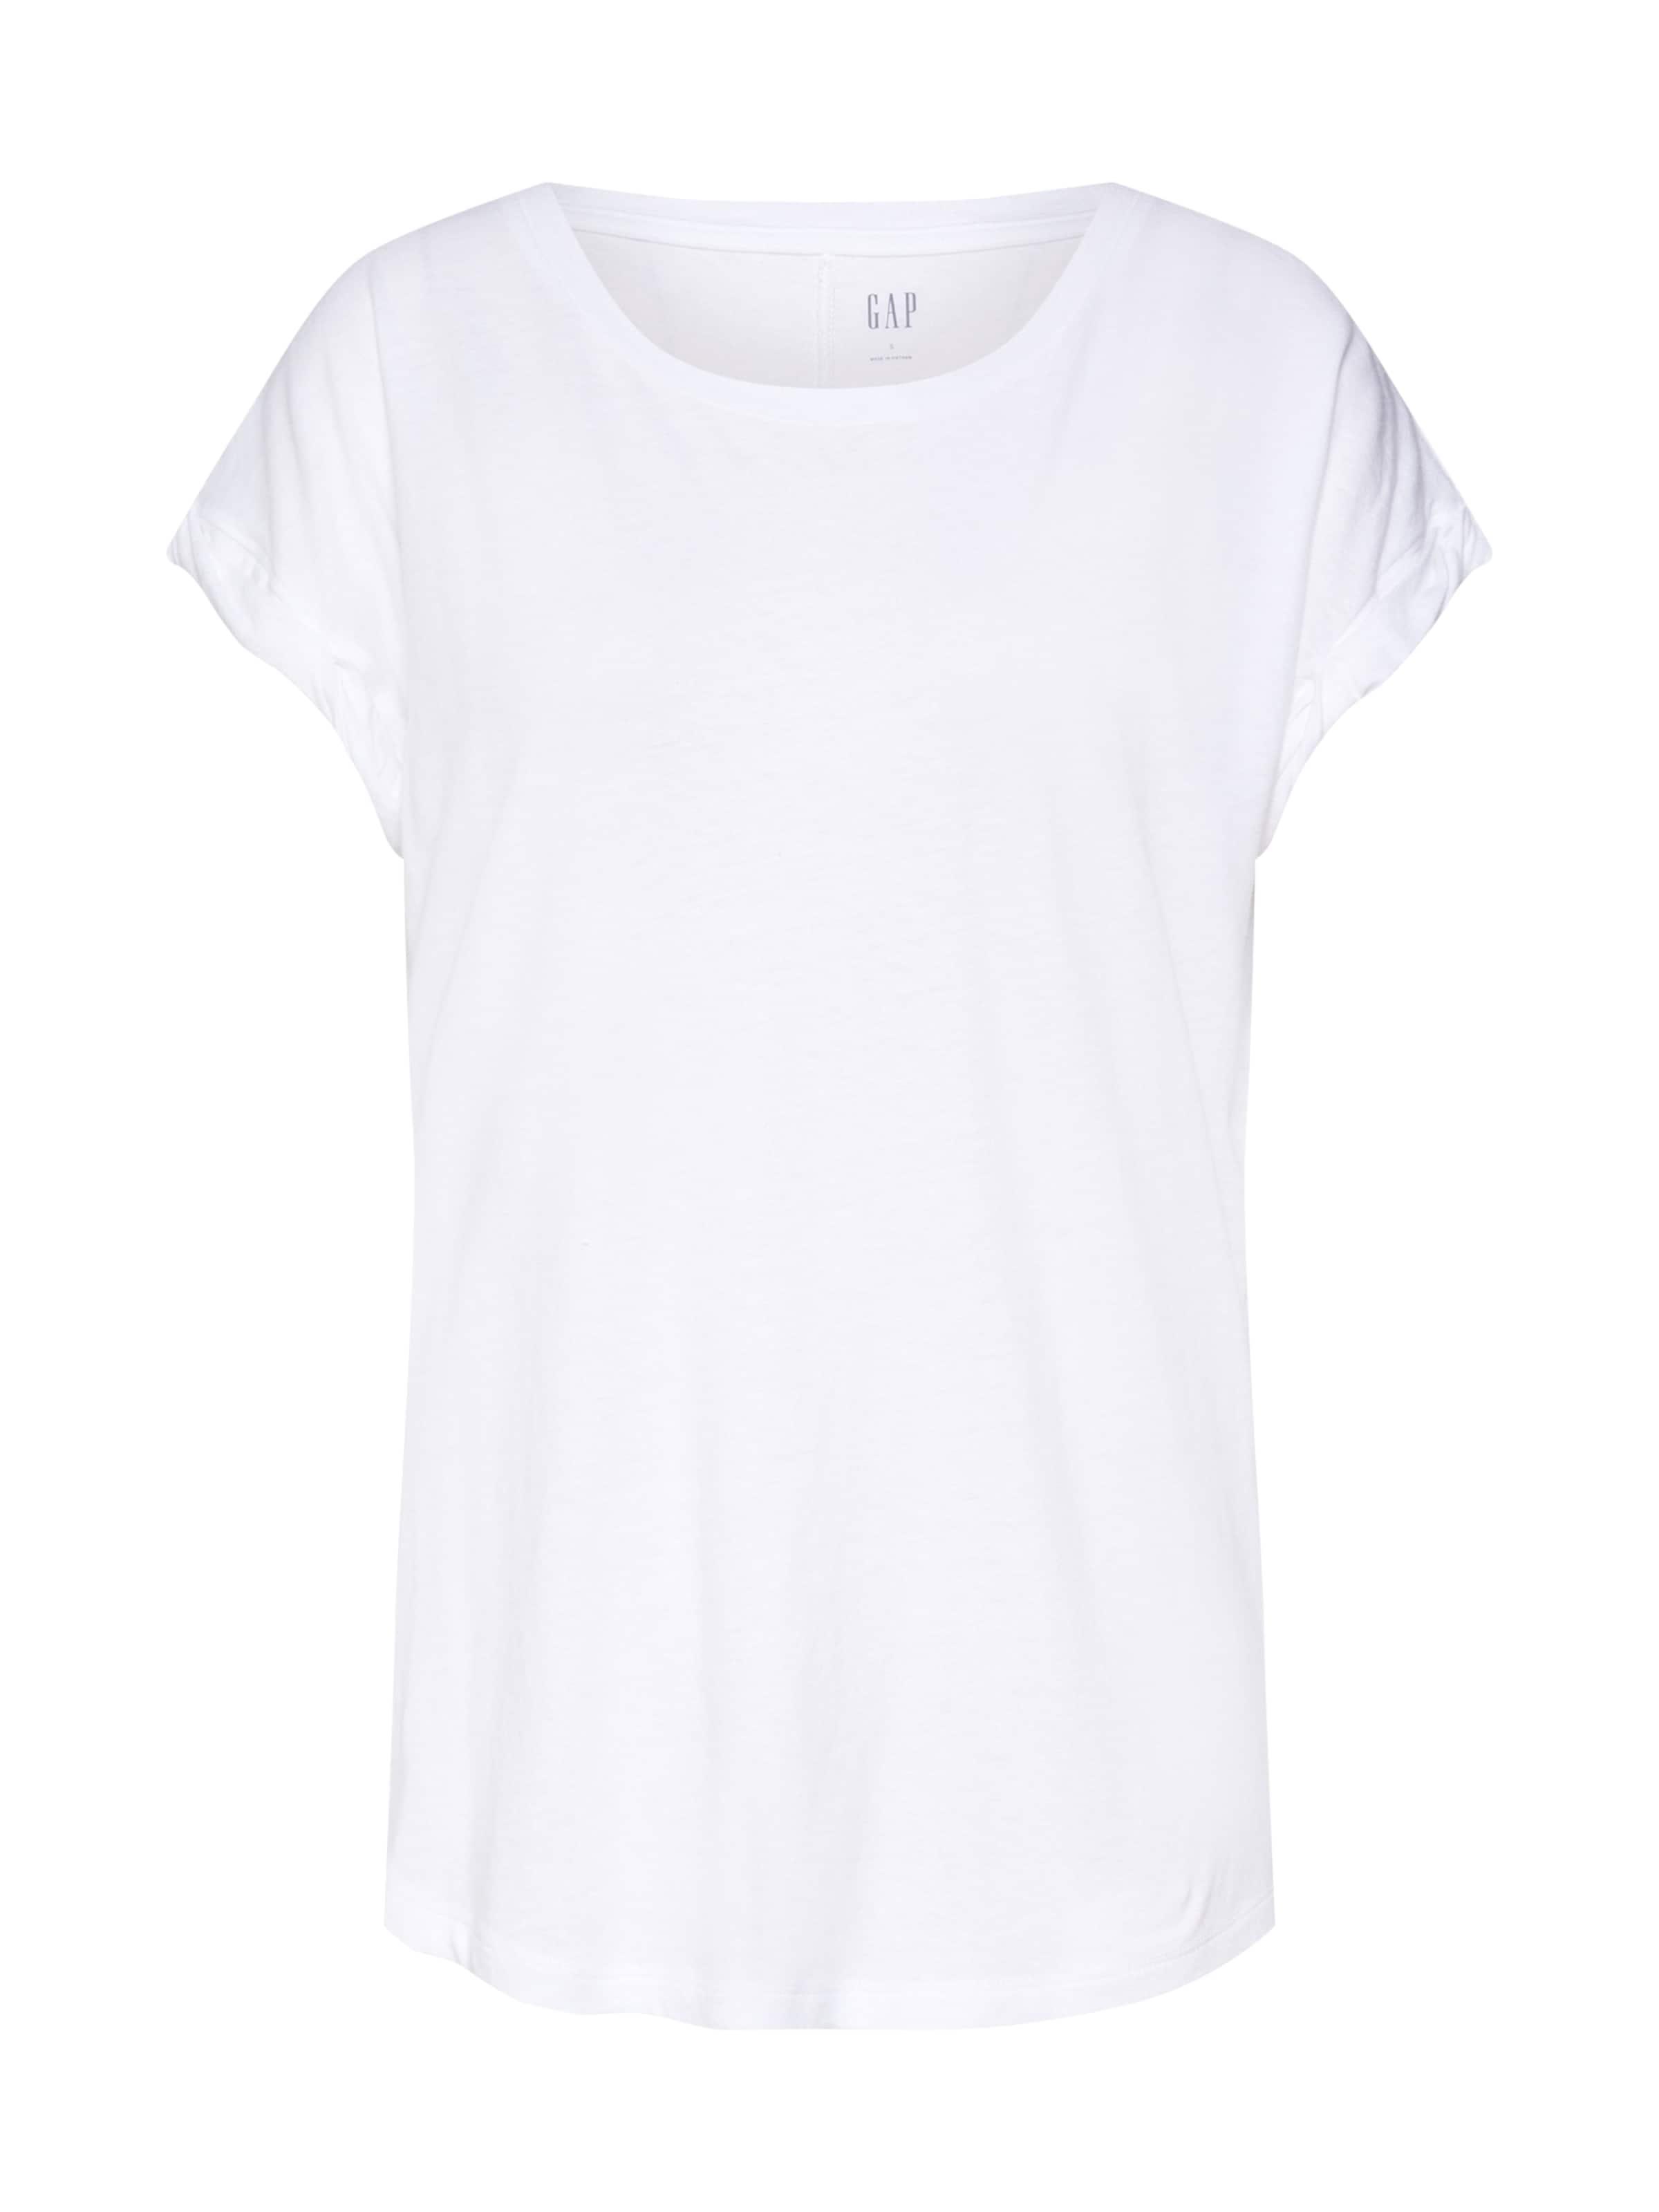 Slv Tee' 'ss Weiß In Gap Roll Auth Shirt KFJTl13c